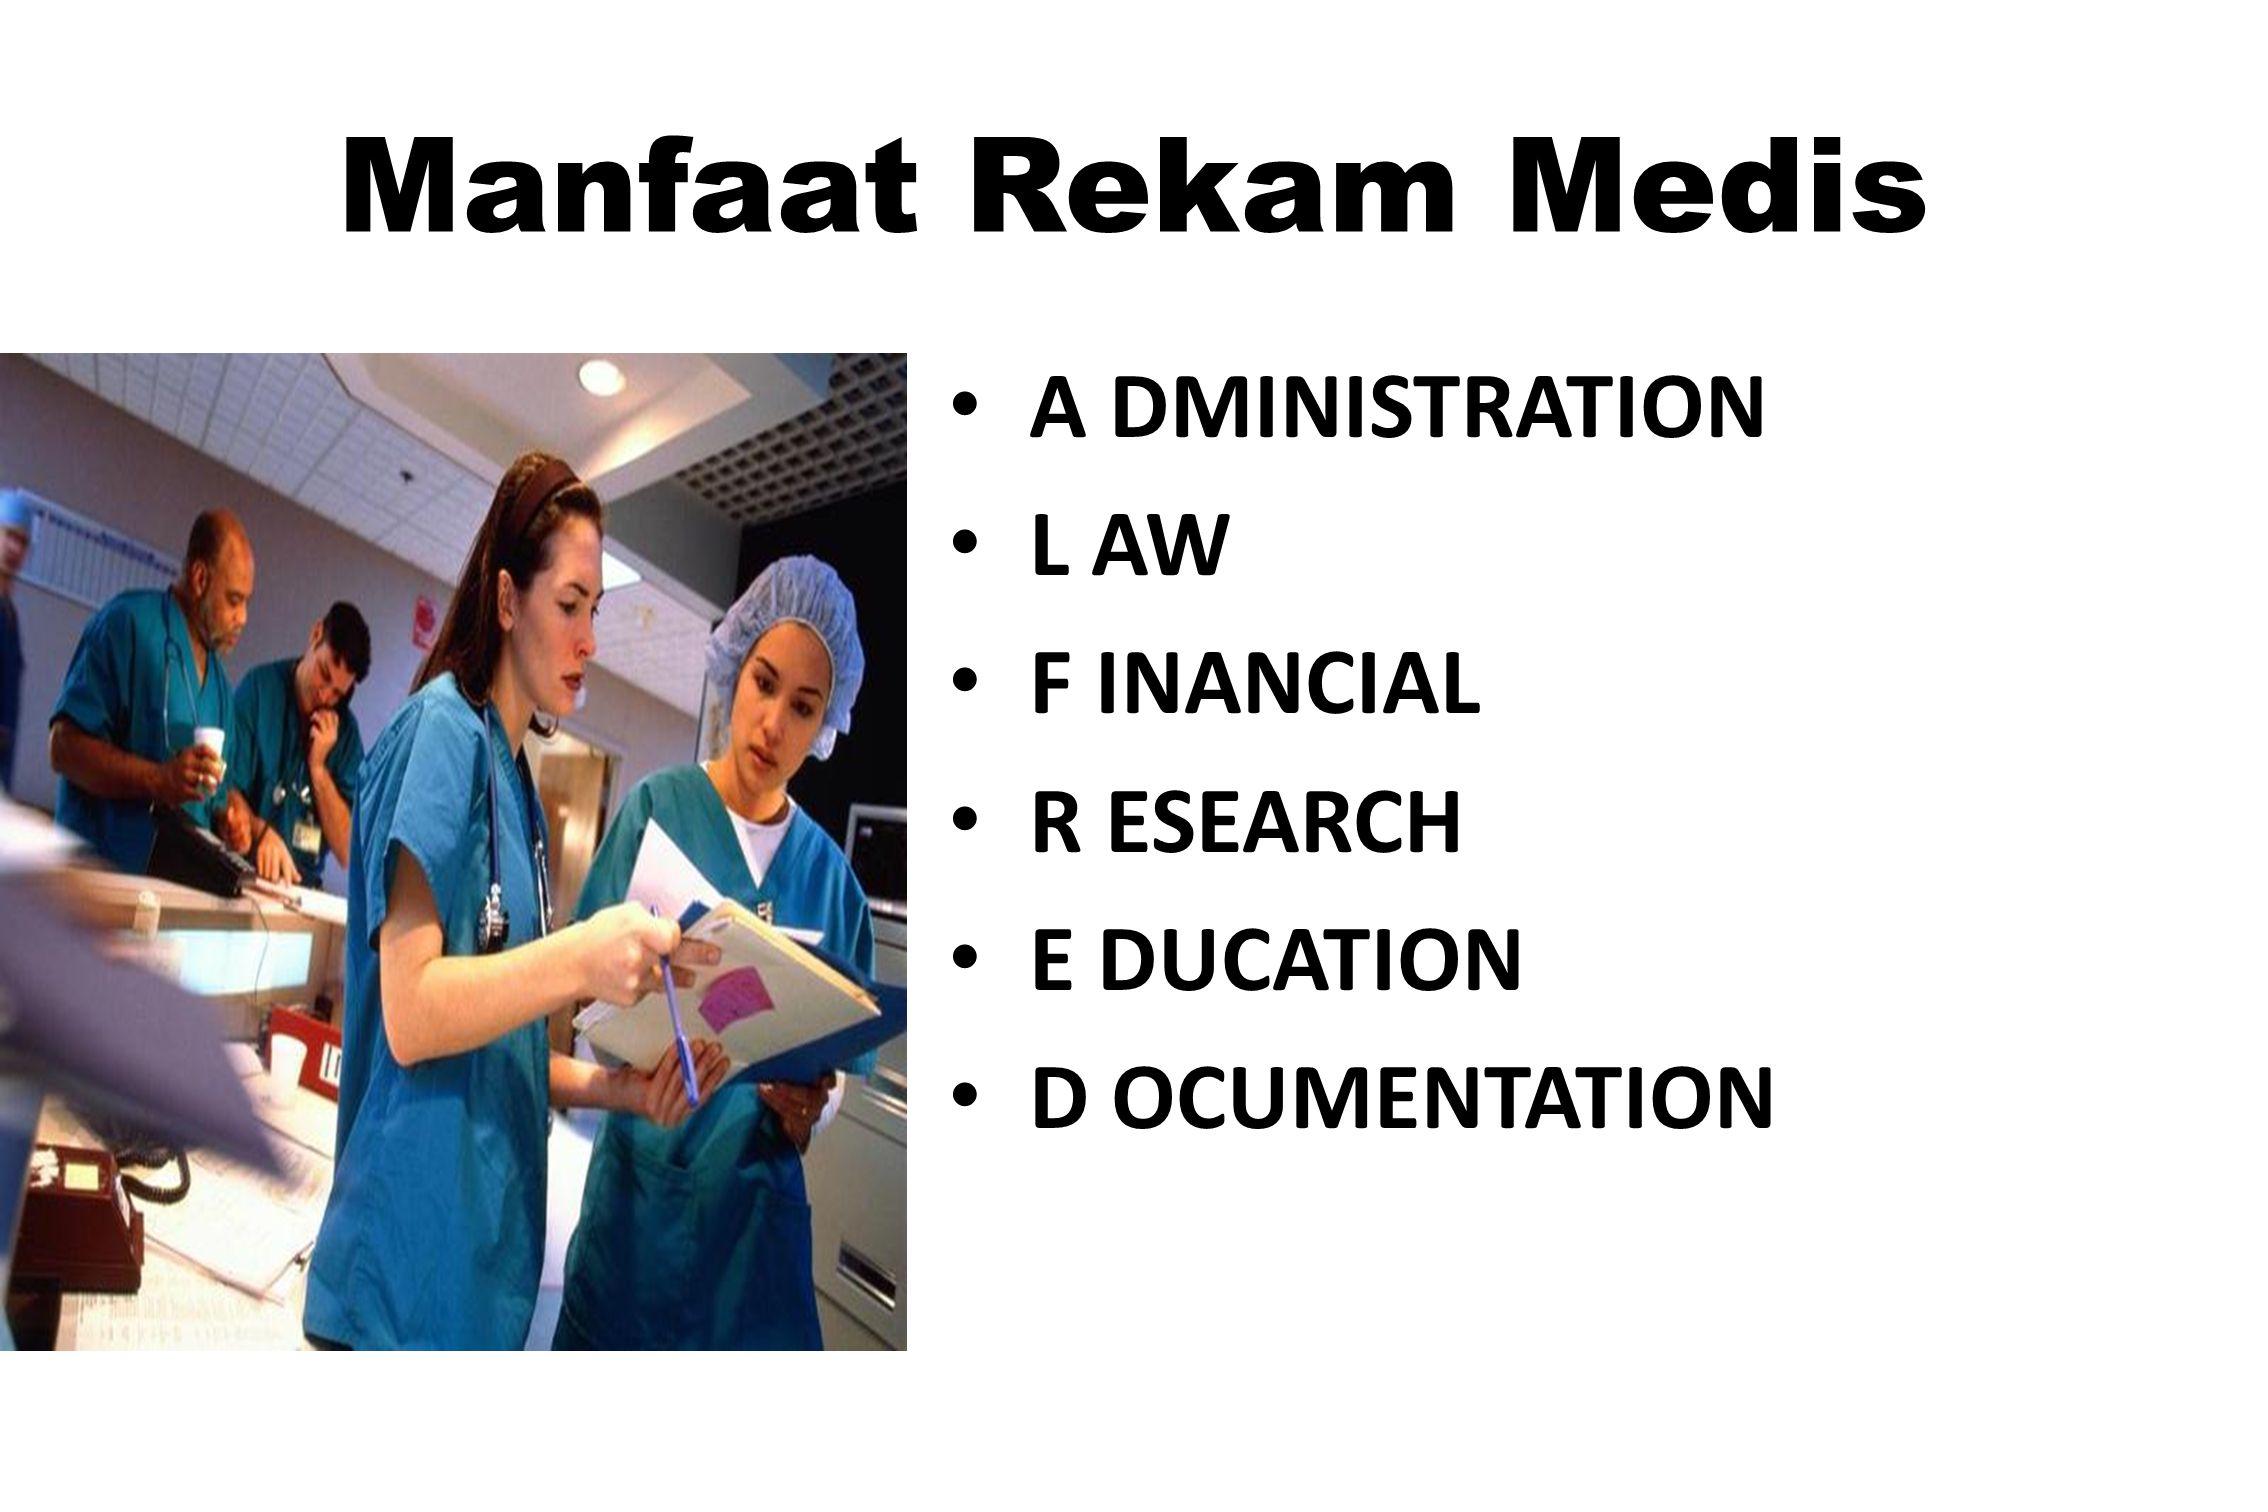 Manfaat Rekam Medis A DMINISTRATION L AW F INANCIAL R ESEARCH